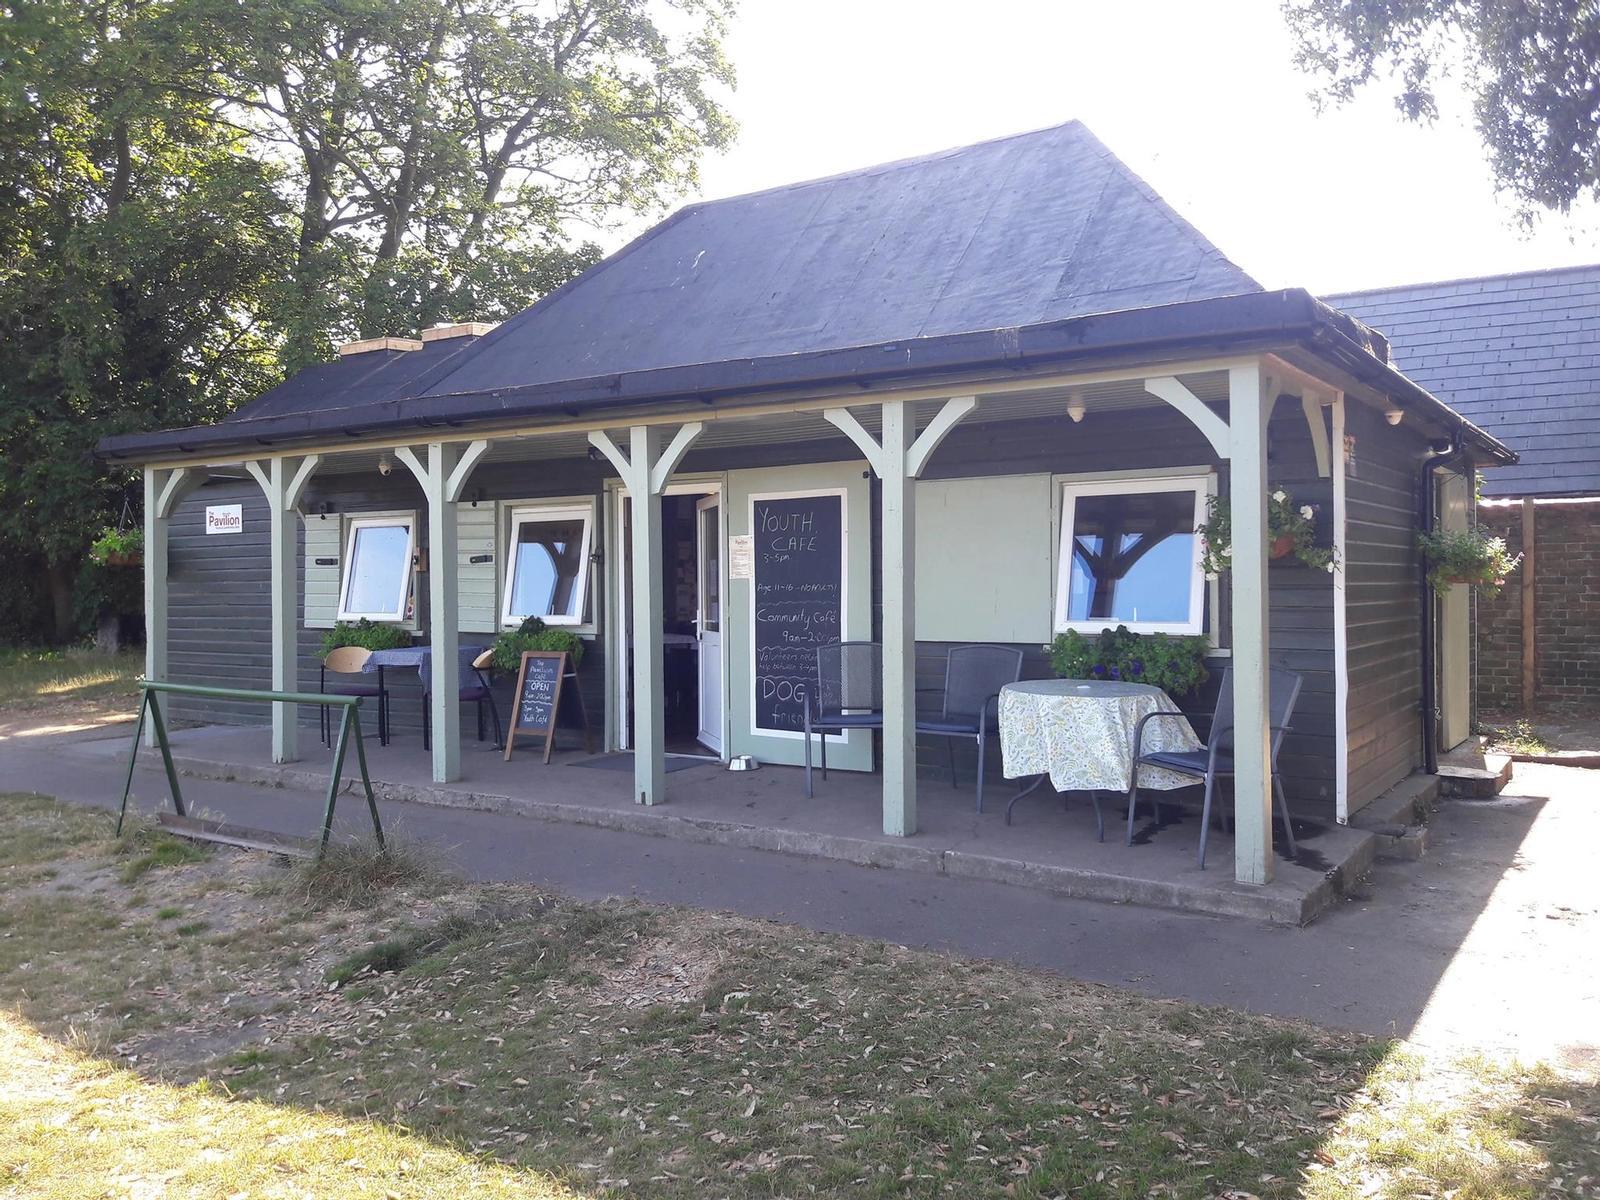 The Pavilion Cafe